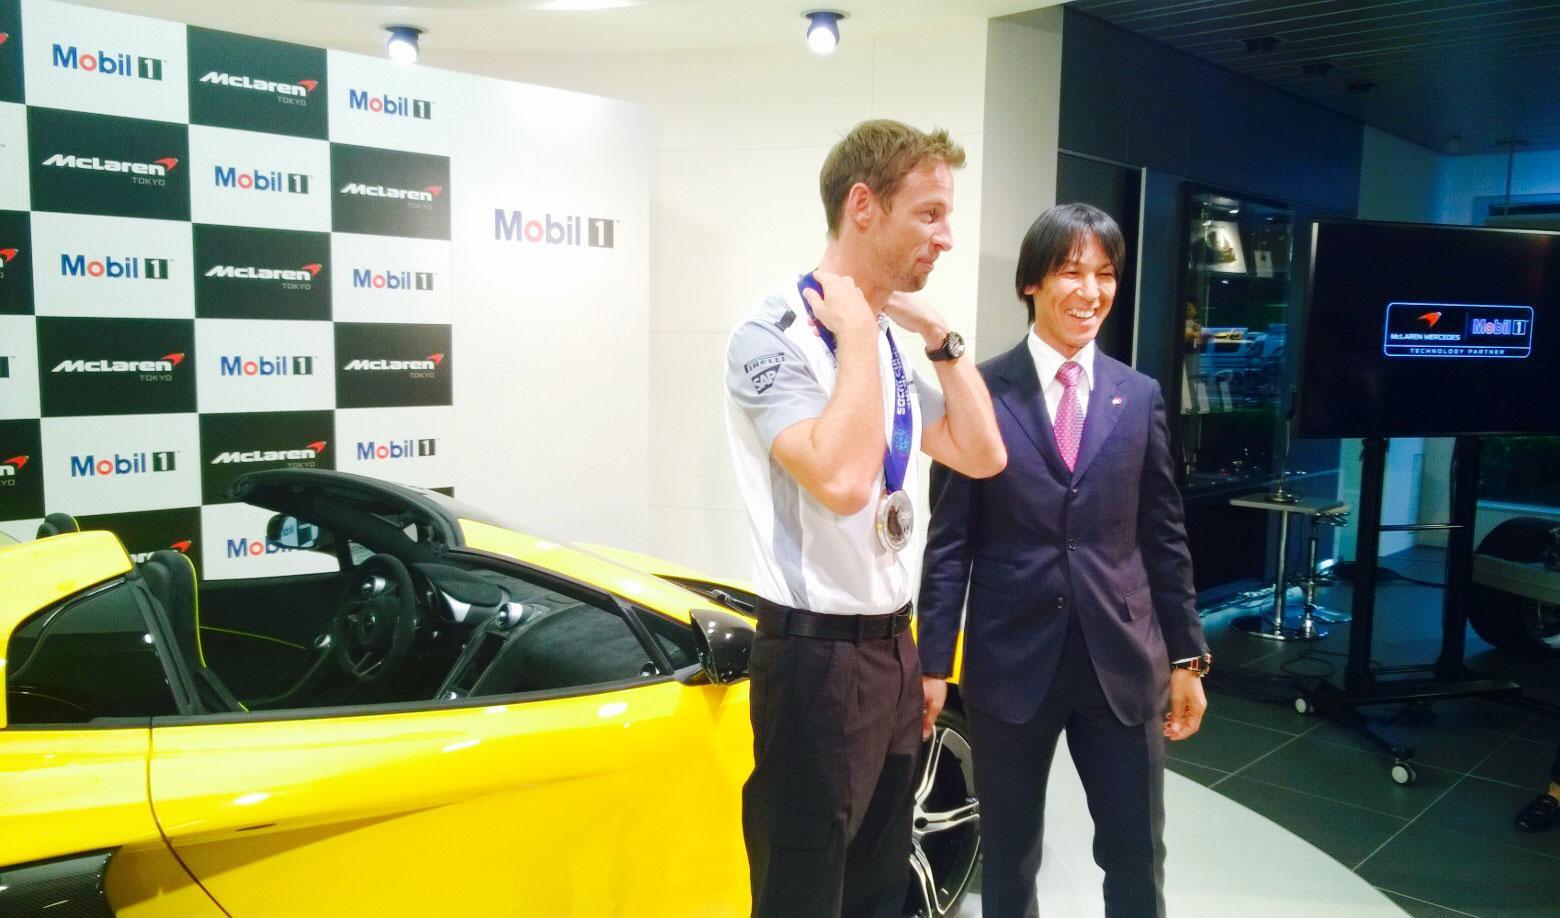 RT @McLarenF1: JB dons Olympic ski jumper Noriaki Kasai's gold medal in Tokyo last night. #NiceBling #Mobil1Insider #JapaneseGP http://t.co…